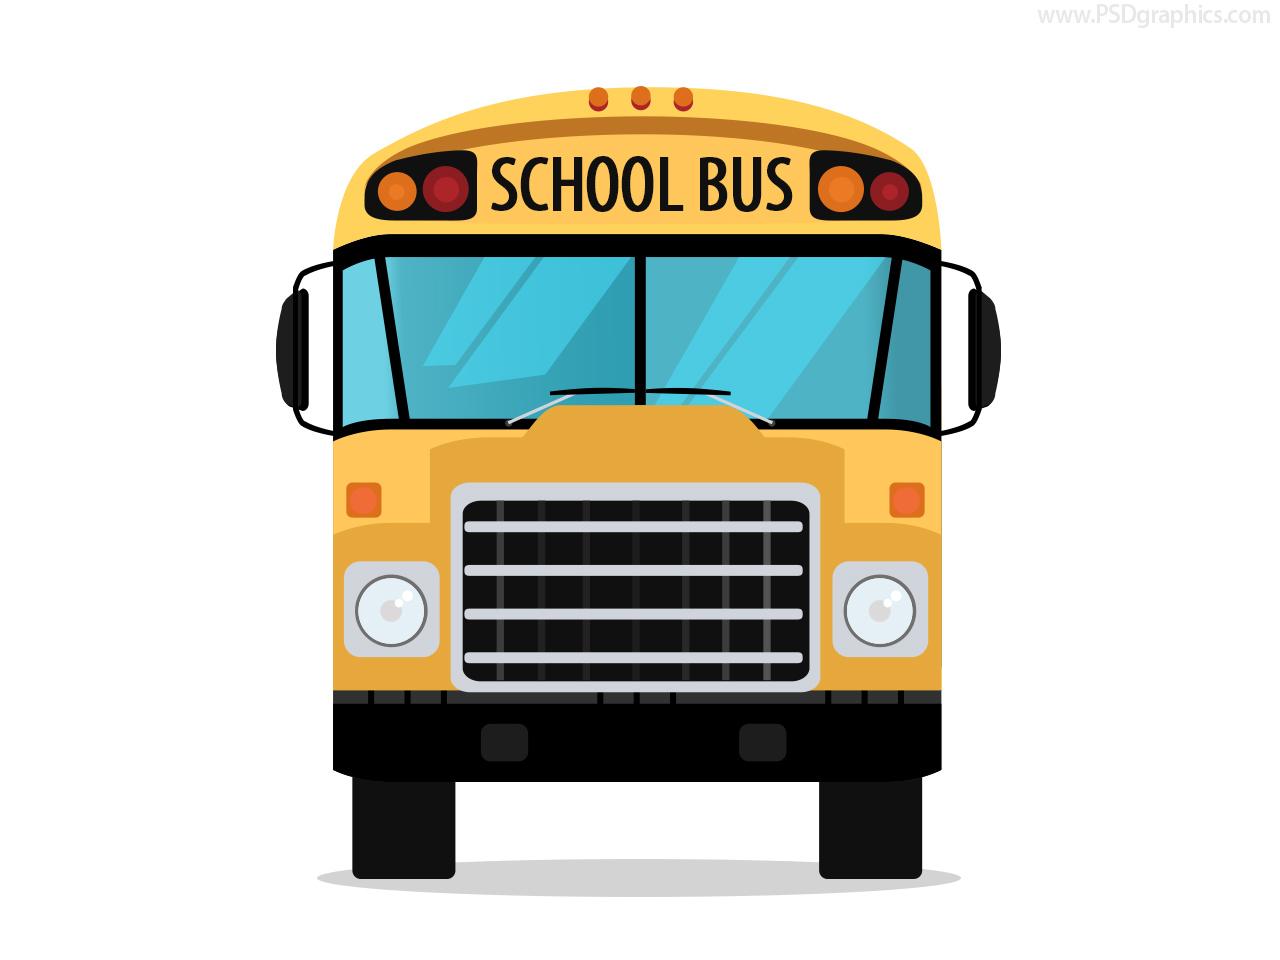 School bus vector drawing 23293 free icons and png backgrounds free icons png school bus vector drawing toneelgroepblik Images